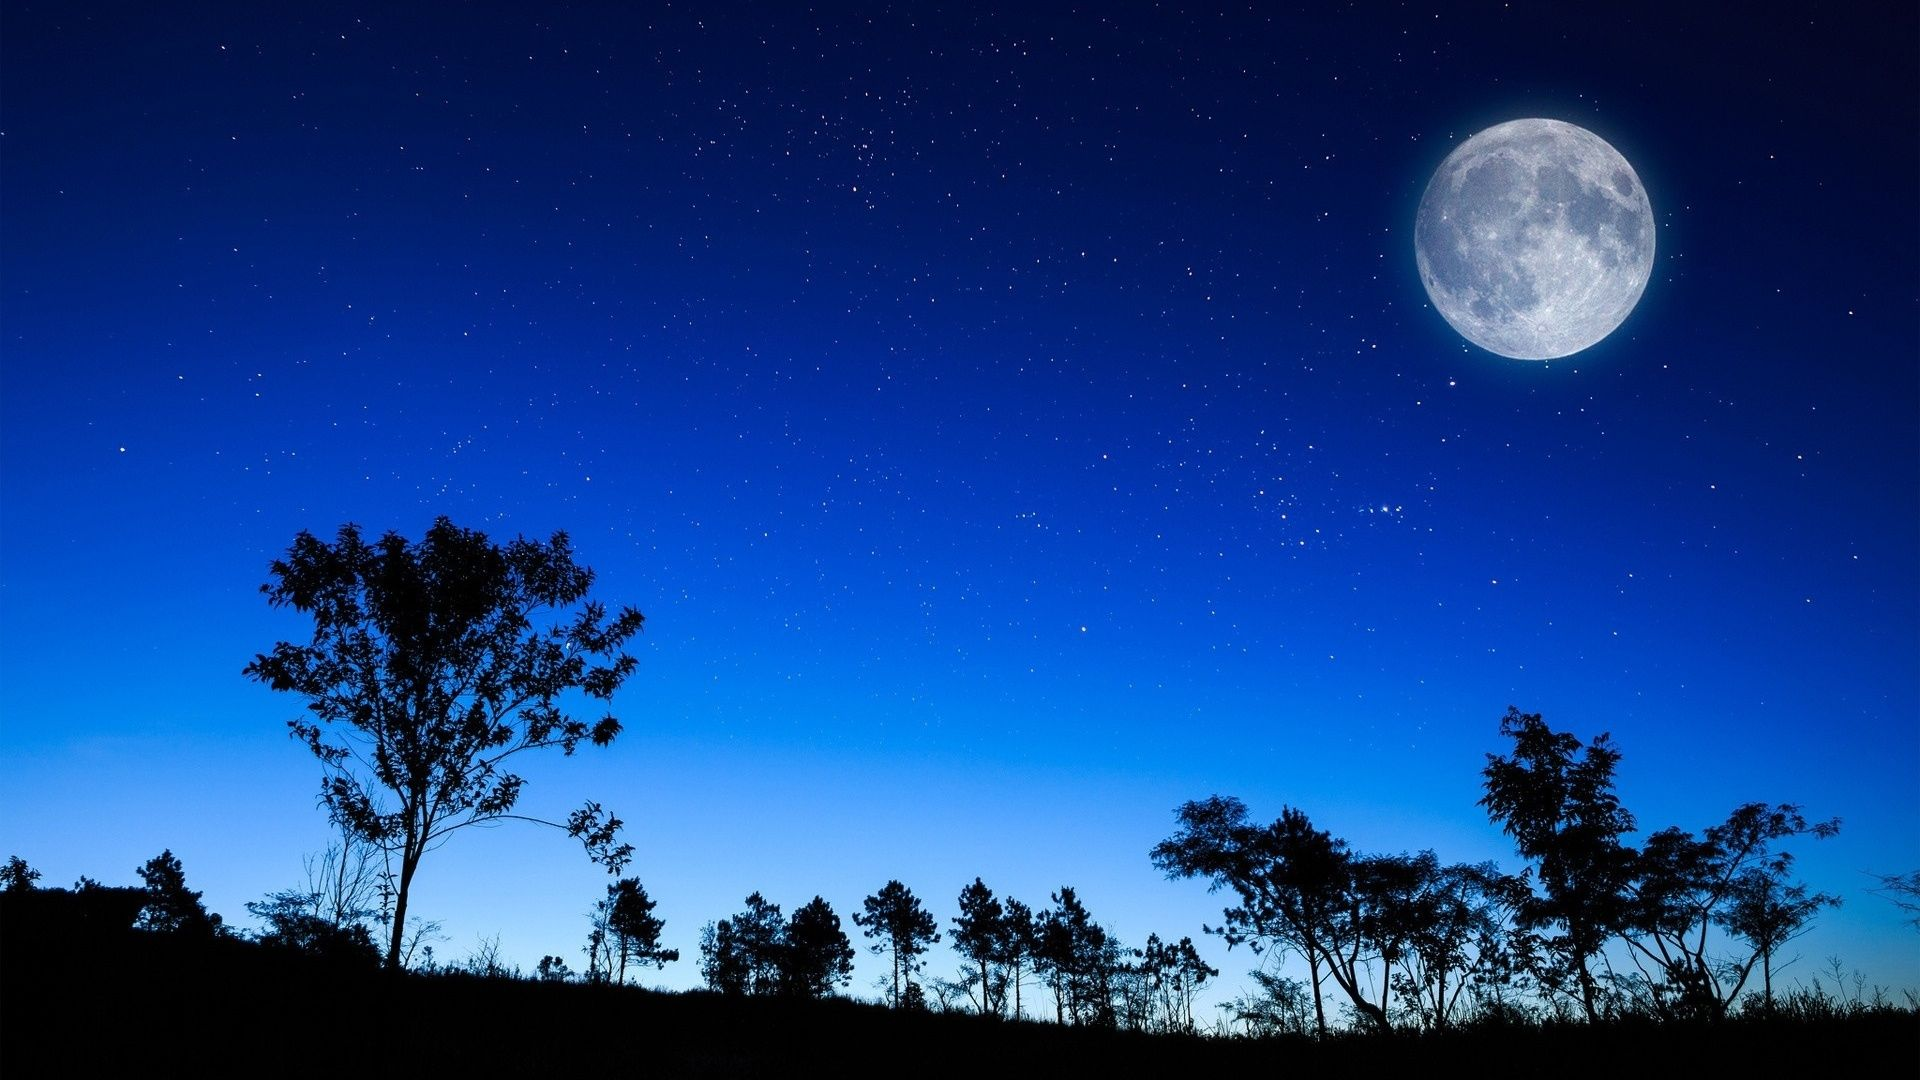 stars, trees , sky - Google Search